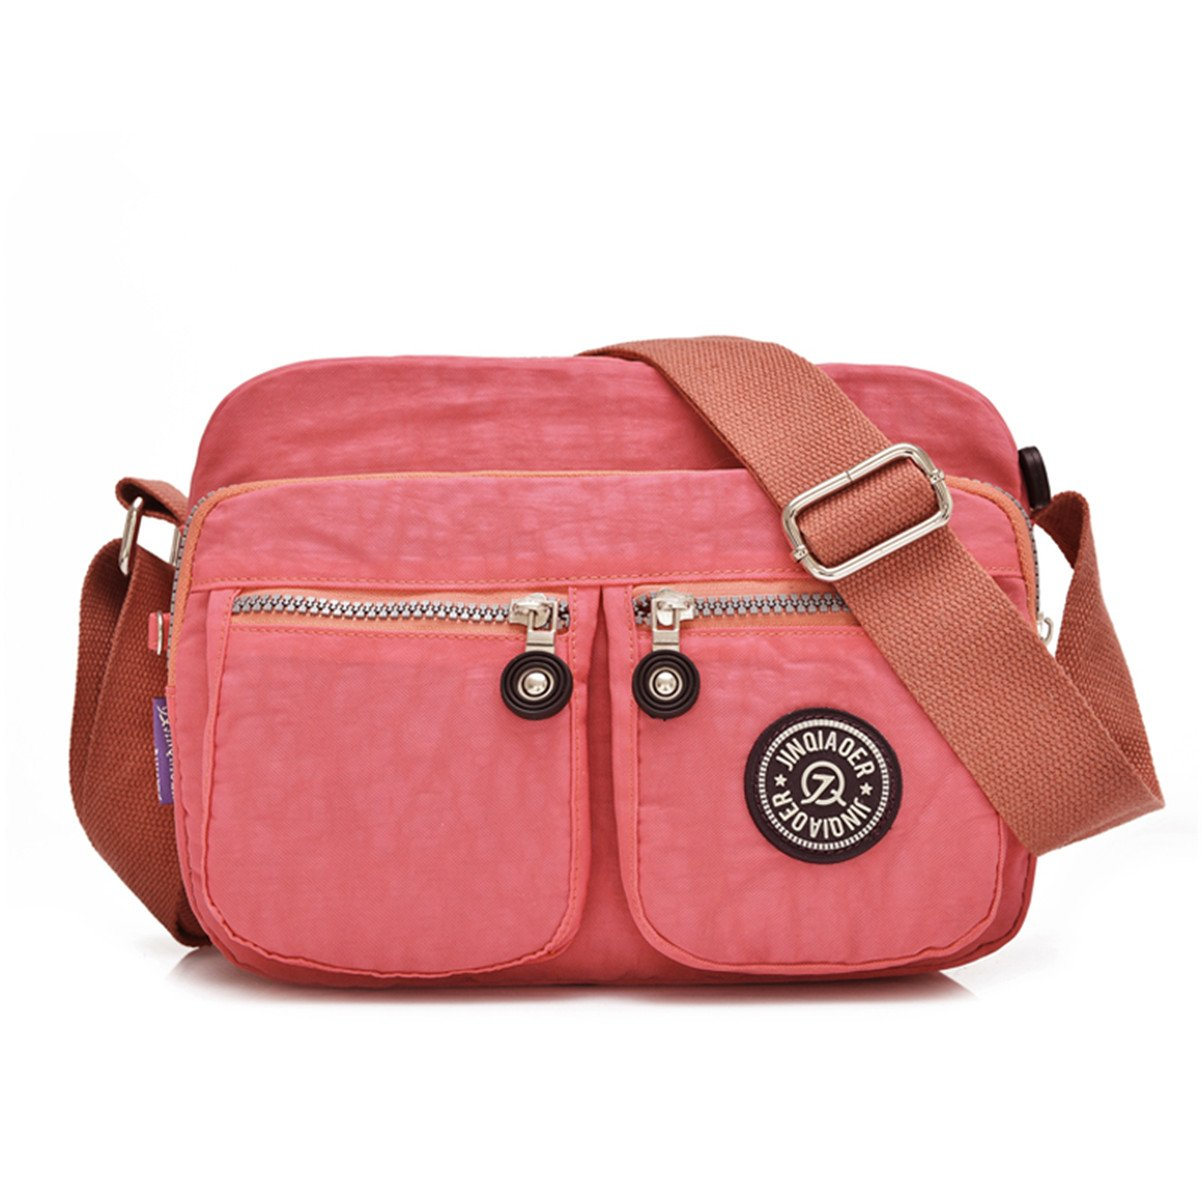 Tiny Chou Lightweight Waterproof Nylon Shoulder Bag Compact Crossbody Messenger Bag with Pockets Pink